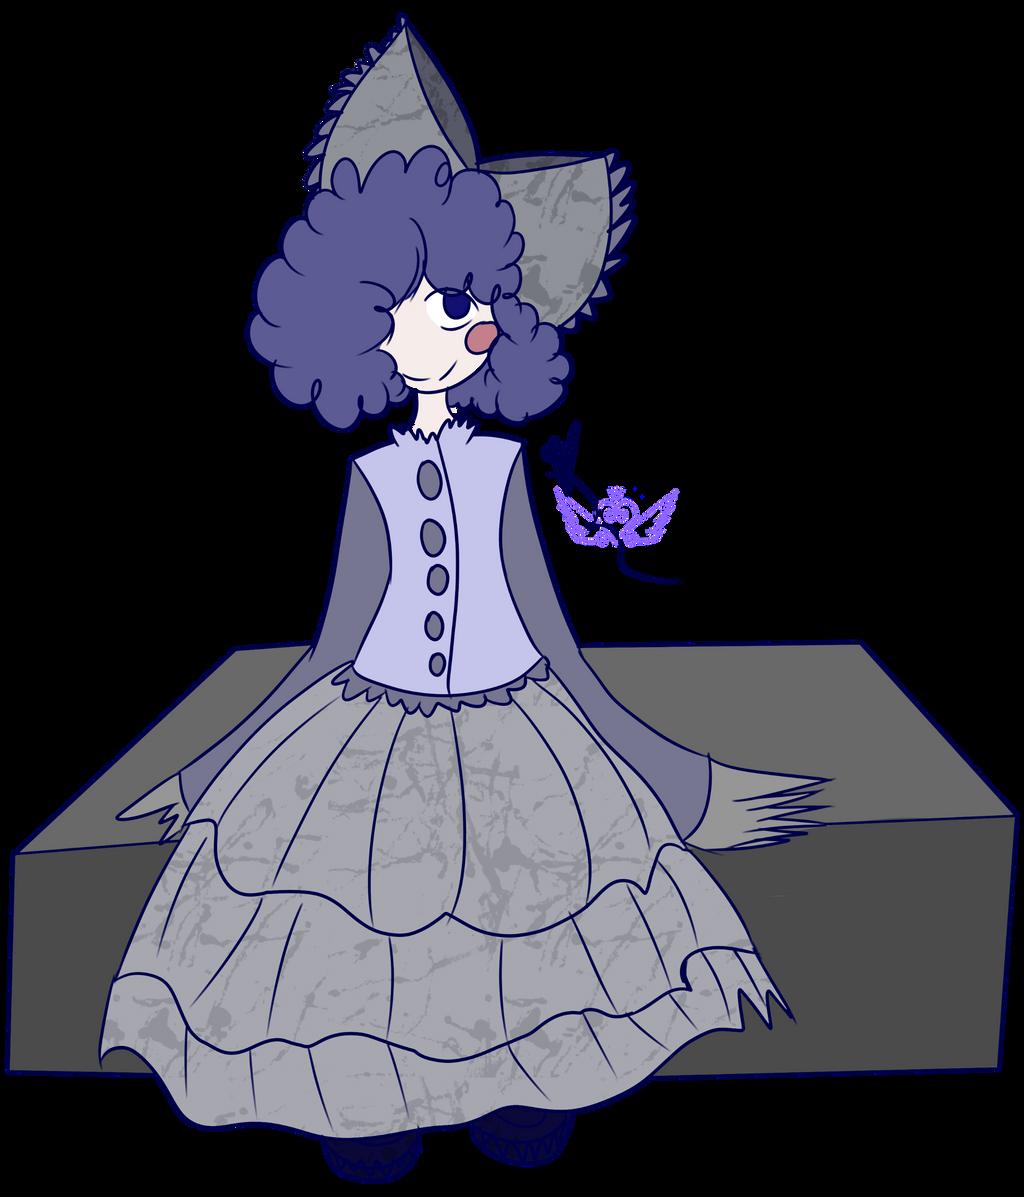 [Dollhouse] Lolita by OpalesquePrincess